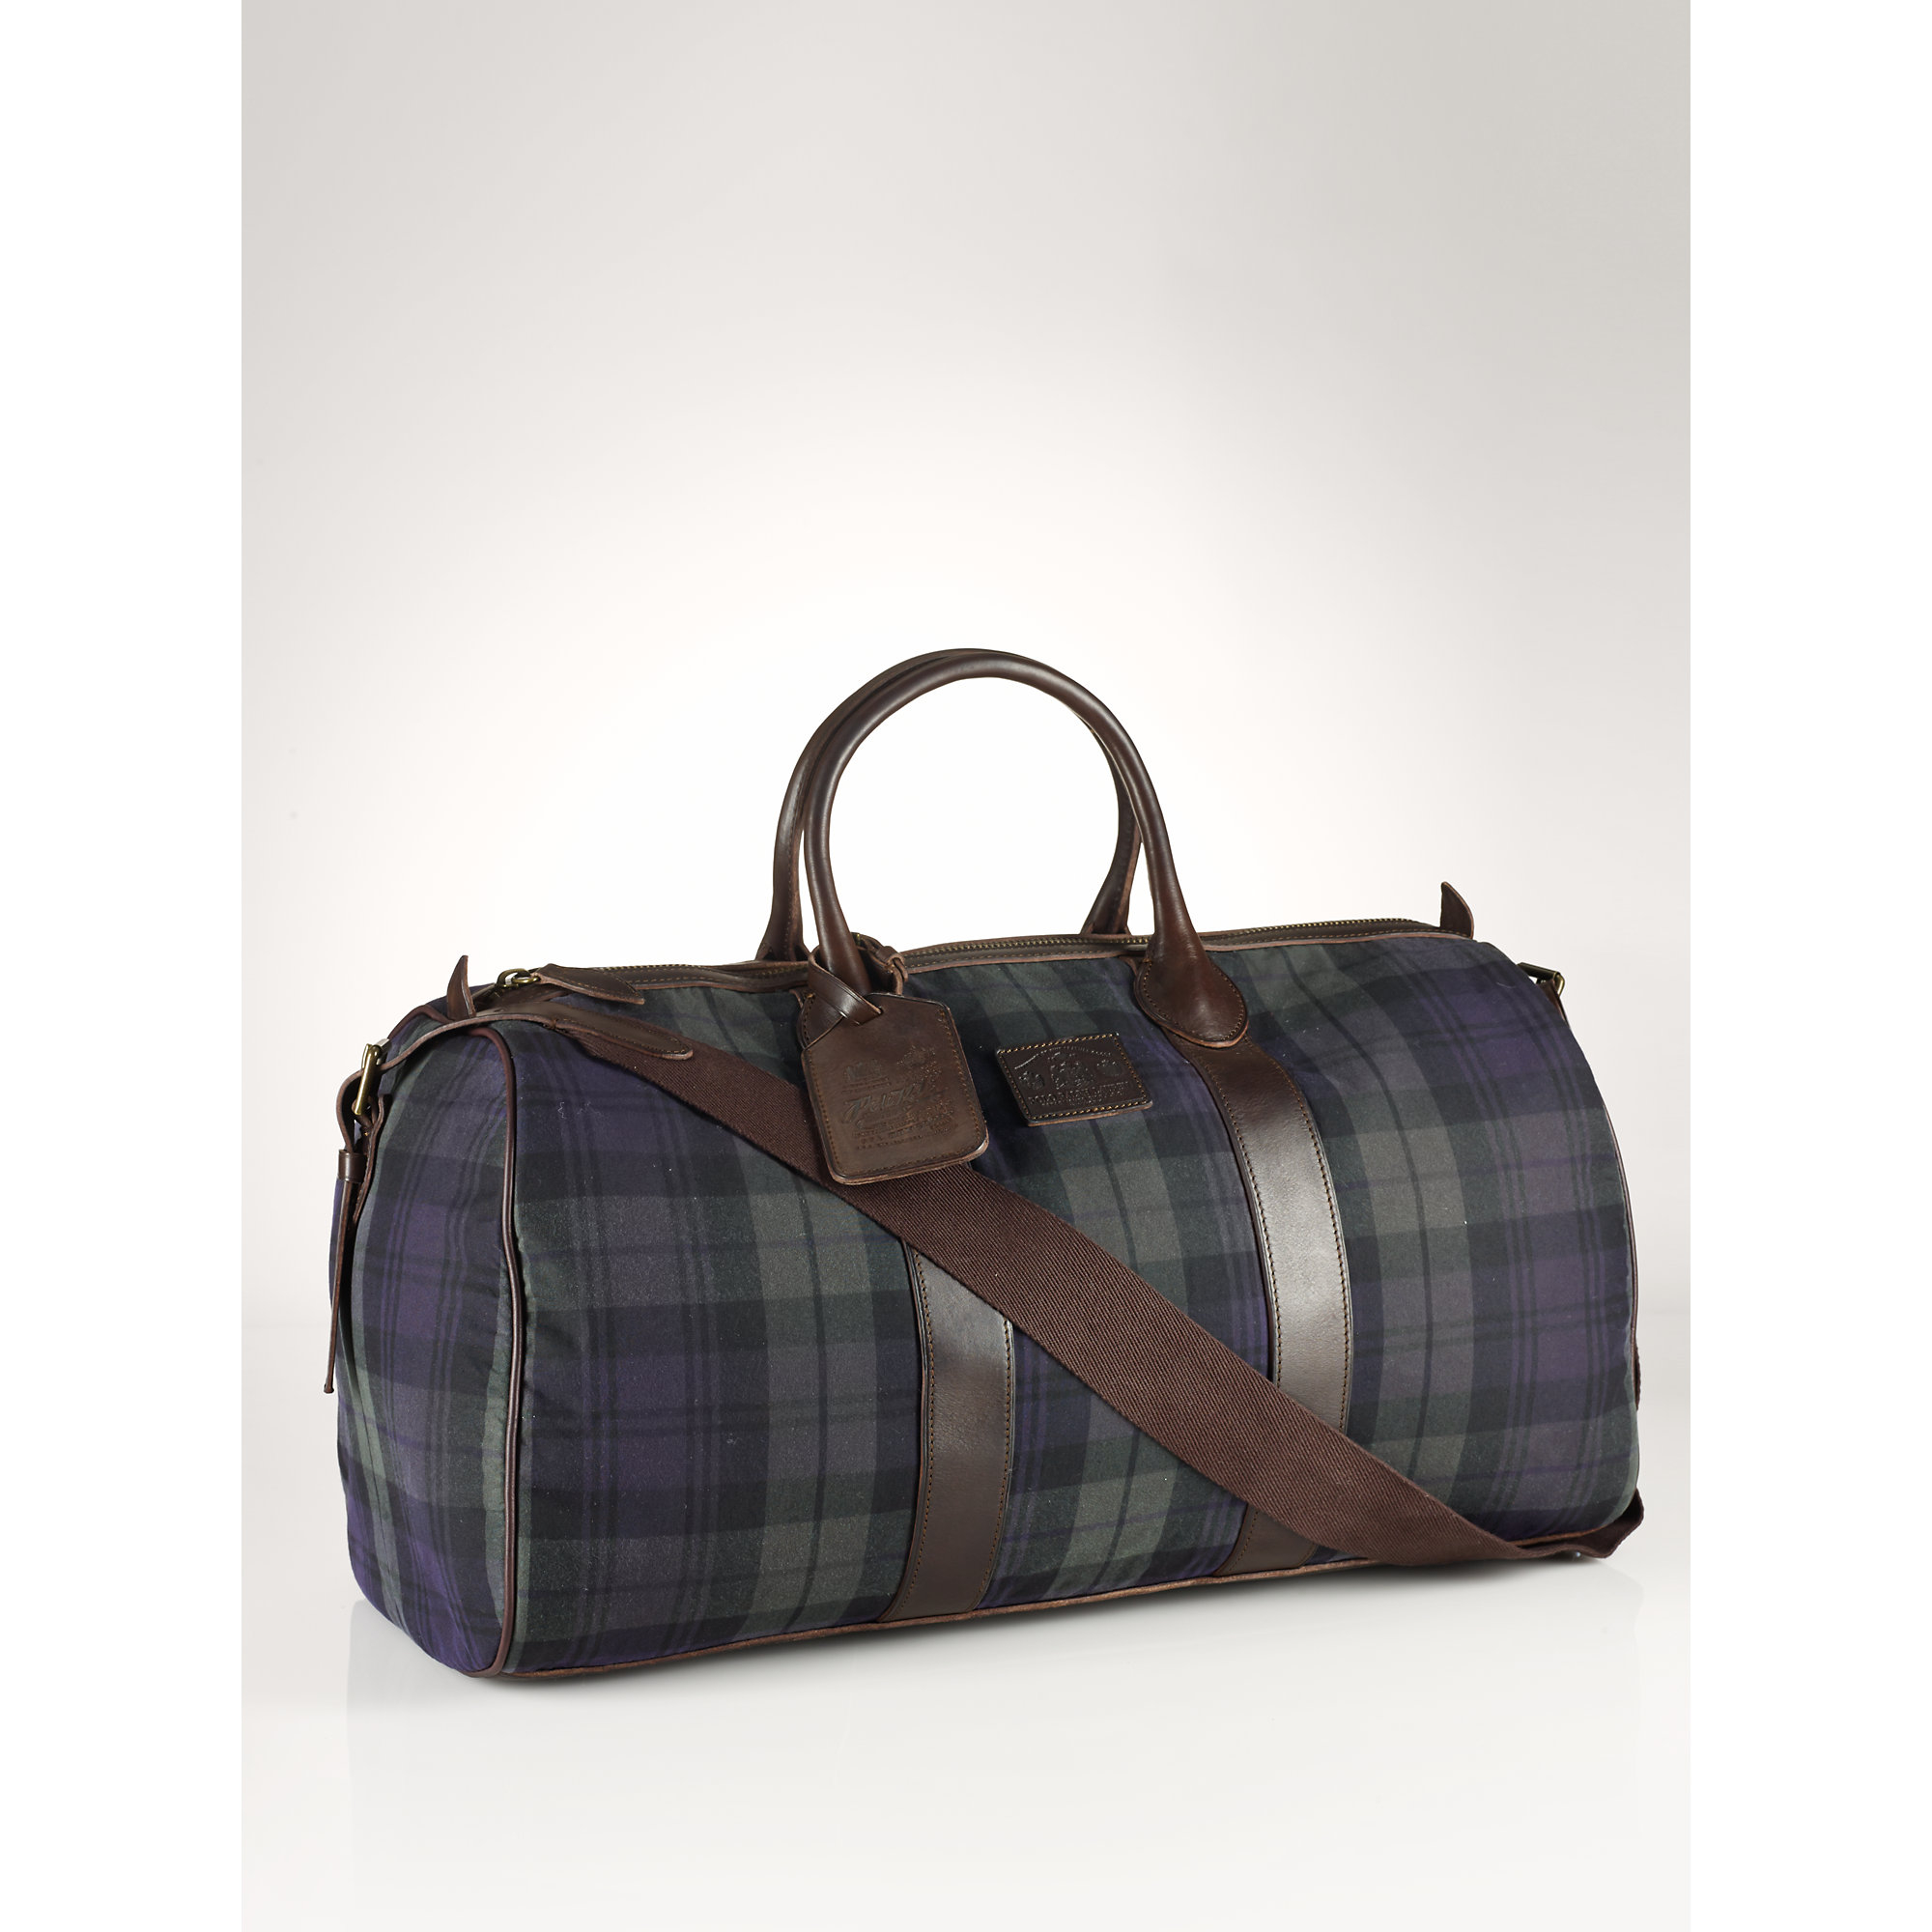 247560068220 Lyst - Polo Ralph Lauren Blackwatch Oilcloth Duffel in Blue for Men